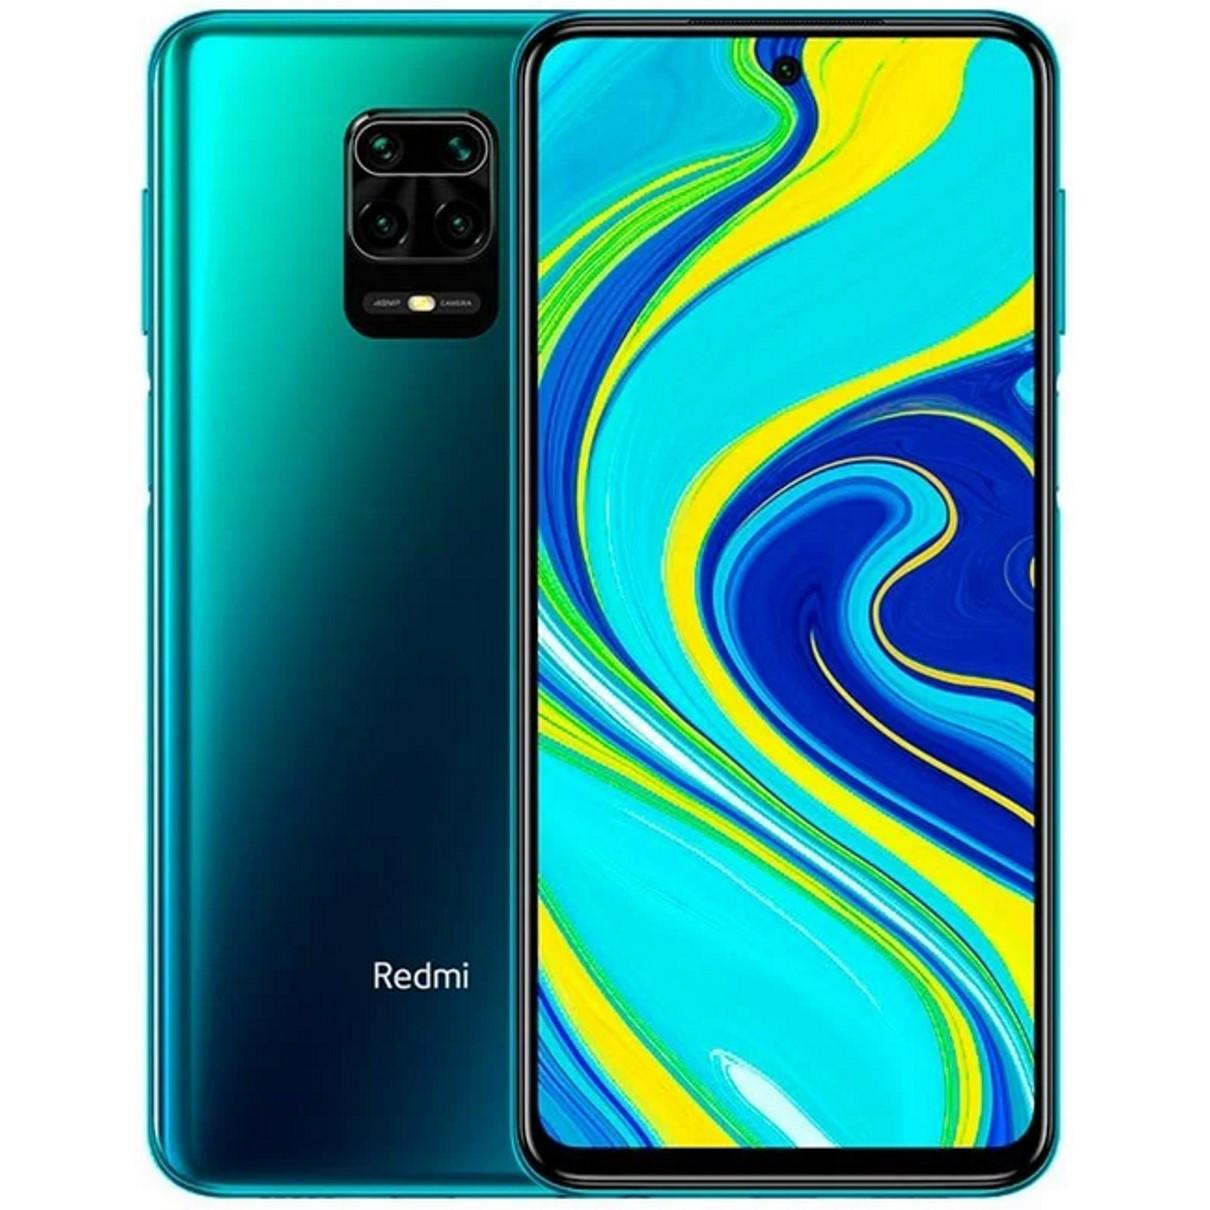 "TELEFONO MOVIL SMARTPHONE XIAOMI REDMI NOTE 9S AURORA BLUE / 6.67""/ 64GB ROM/ 4GB RAM/ 48+8+5+2MPX/ 16MPX/ 5020 MAH/ 5G/ HUELLA/ OCTA CORE"